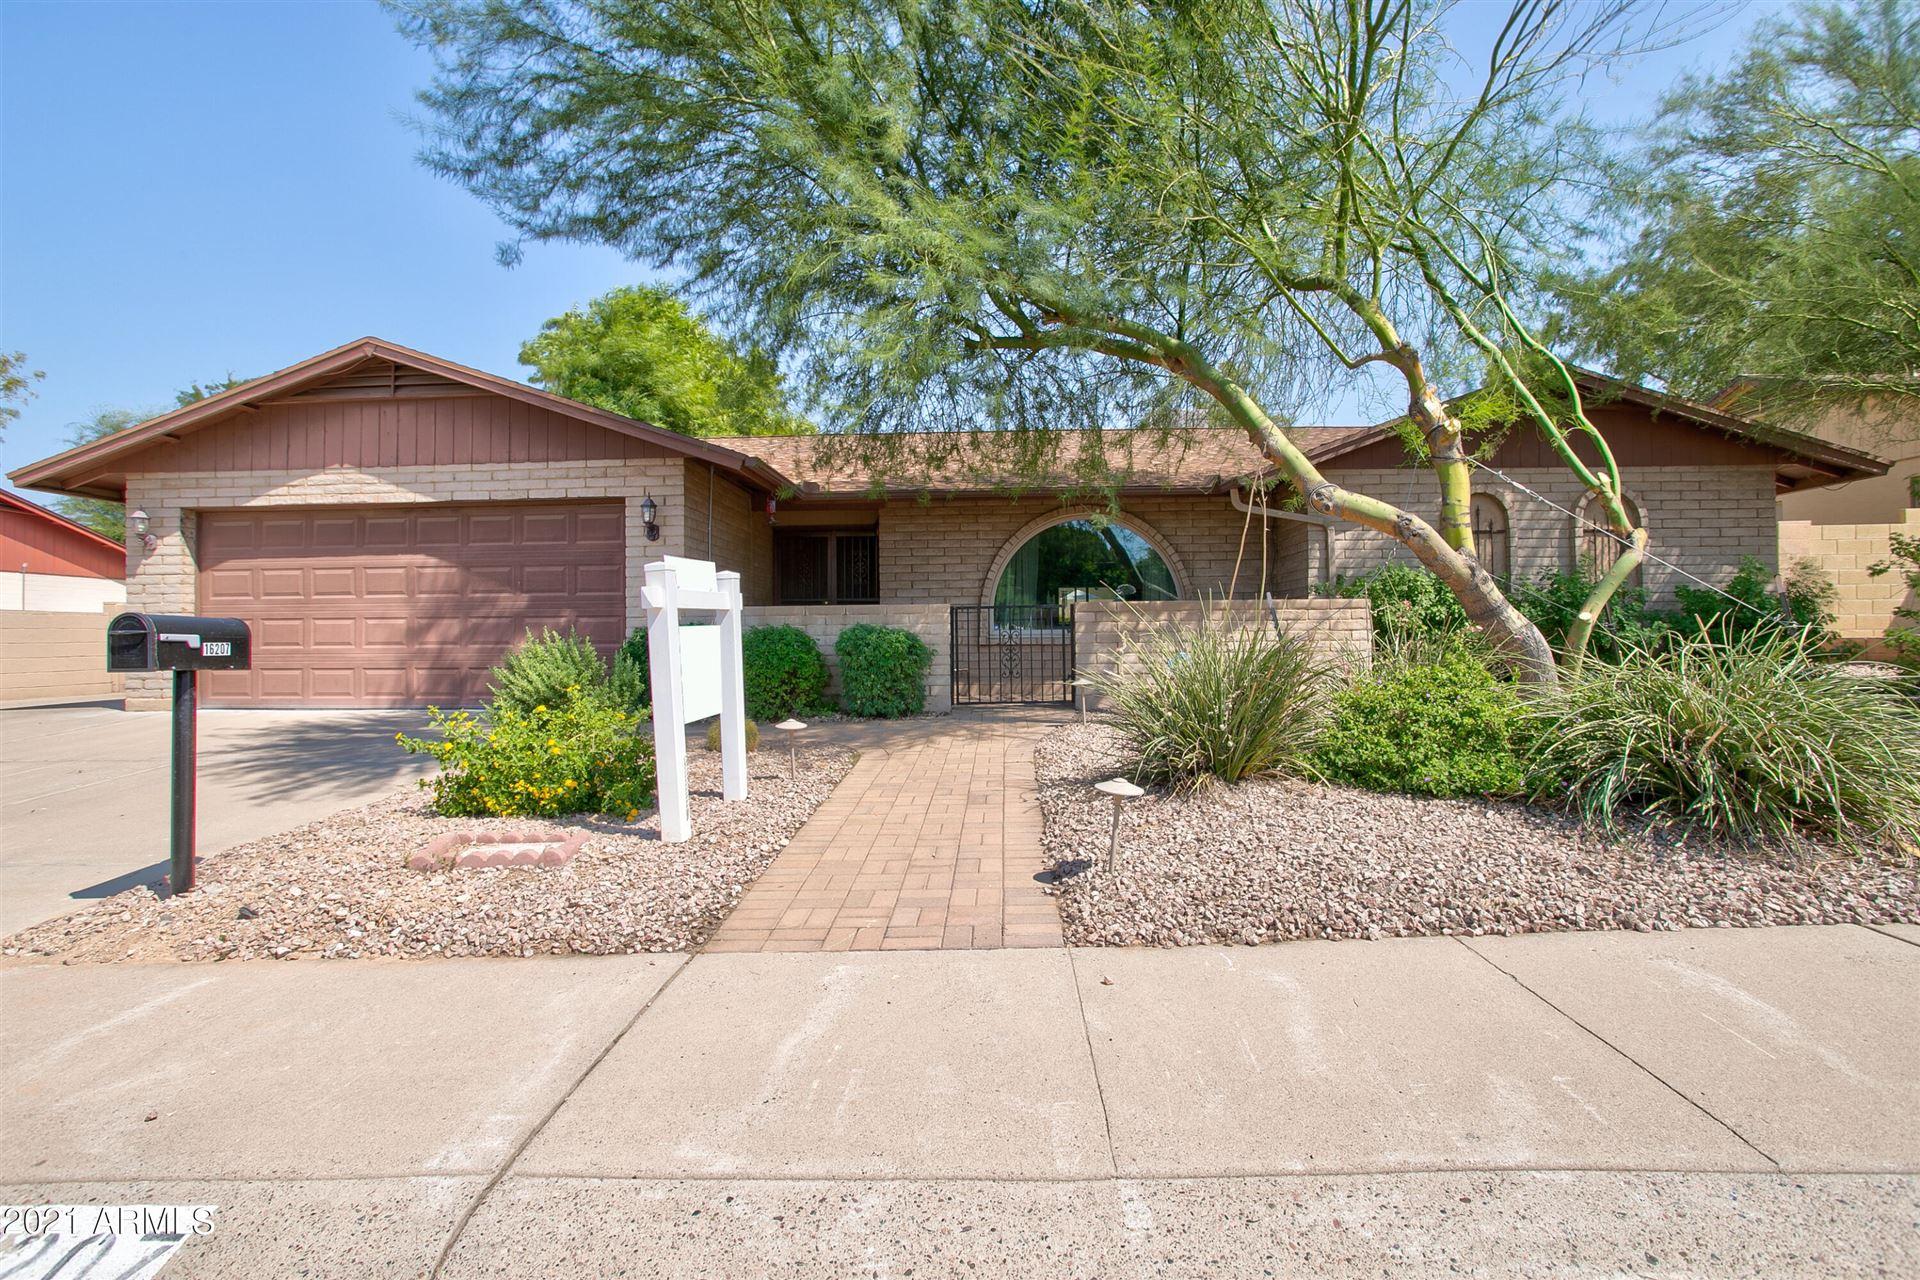 16207 N 11TH Place, Phoenix, AZ 85022 - MLS#: 6293937